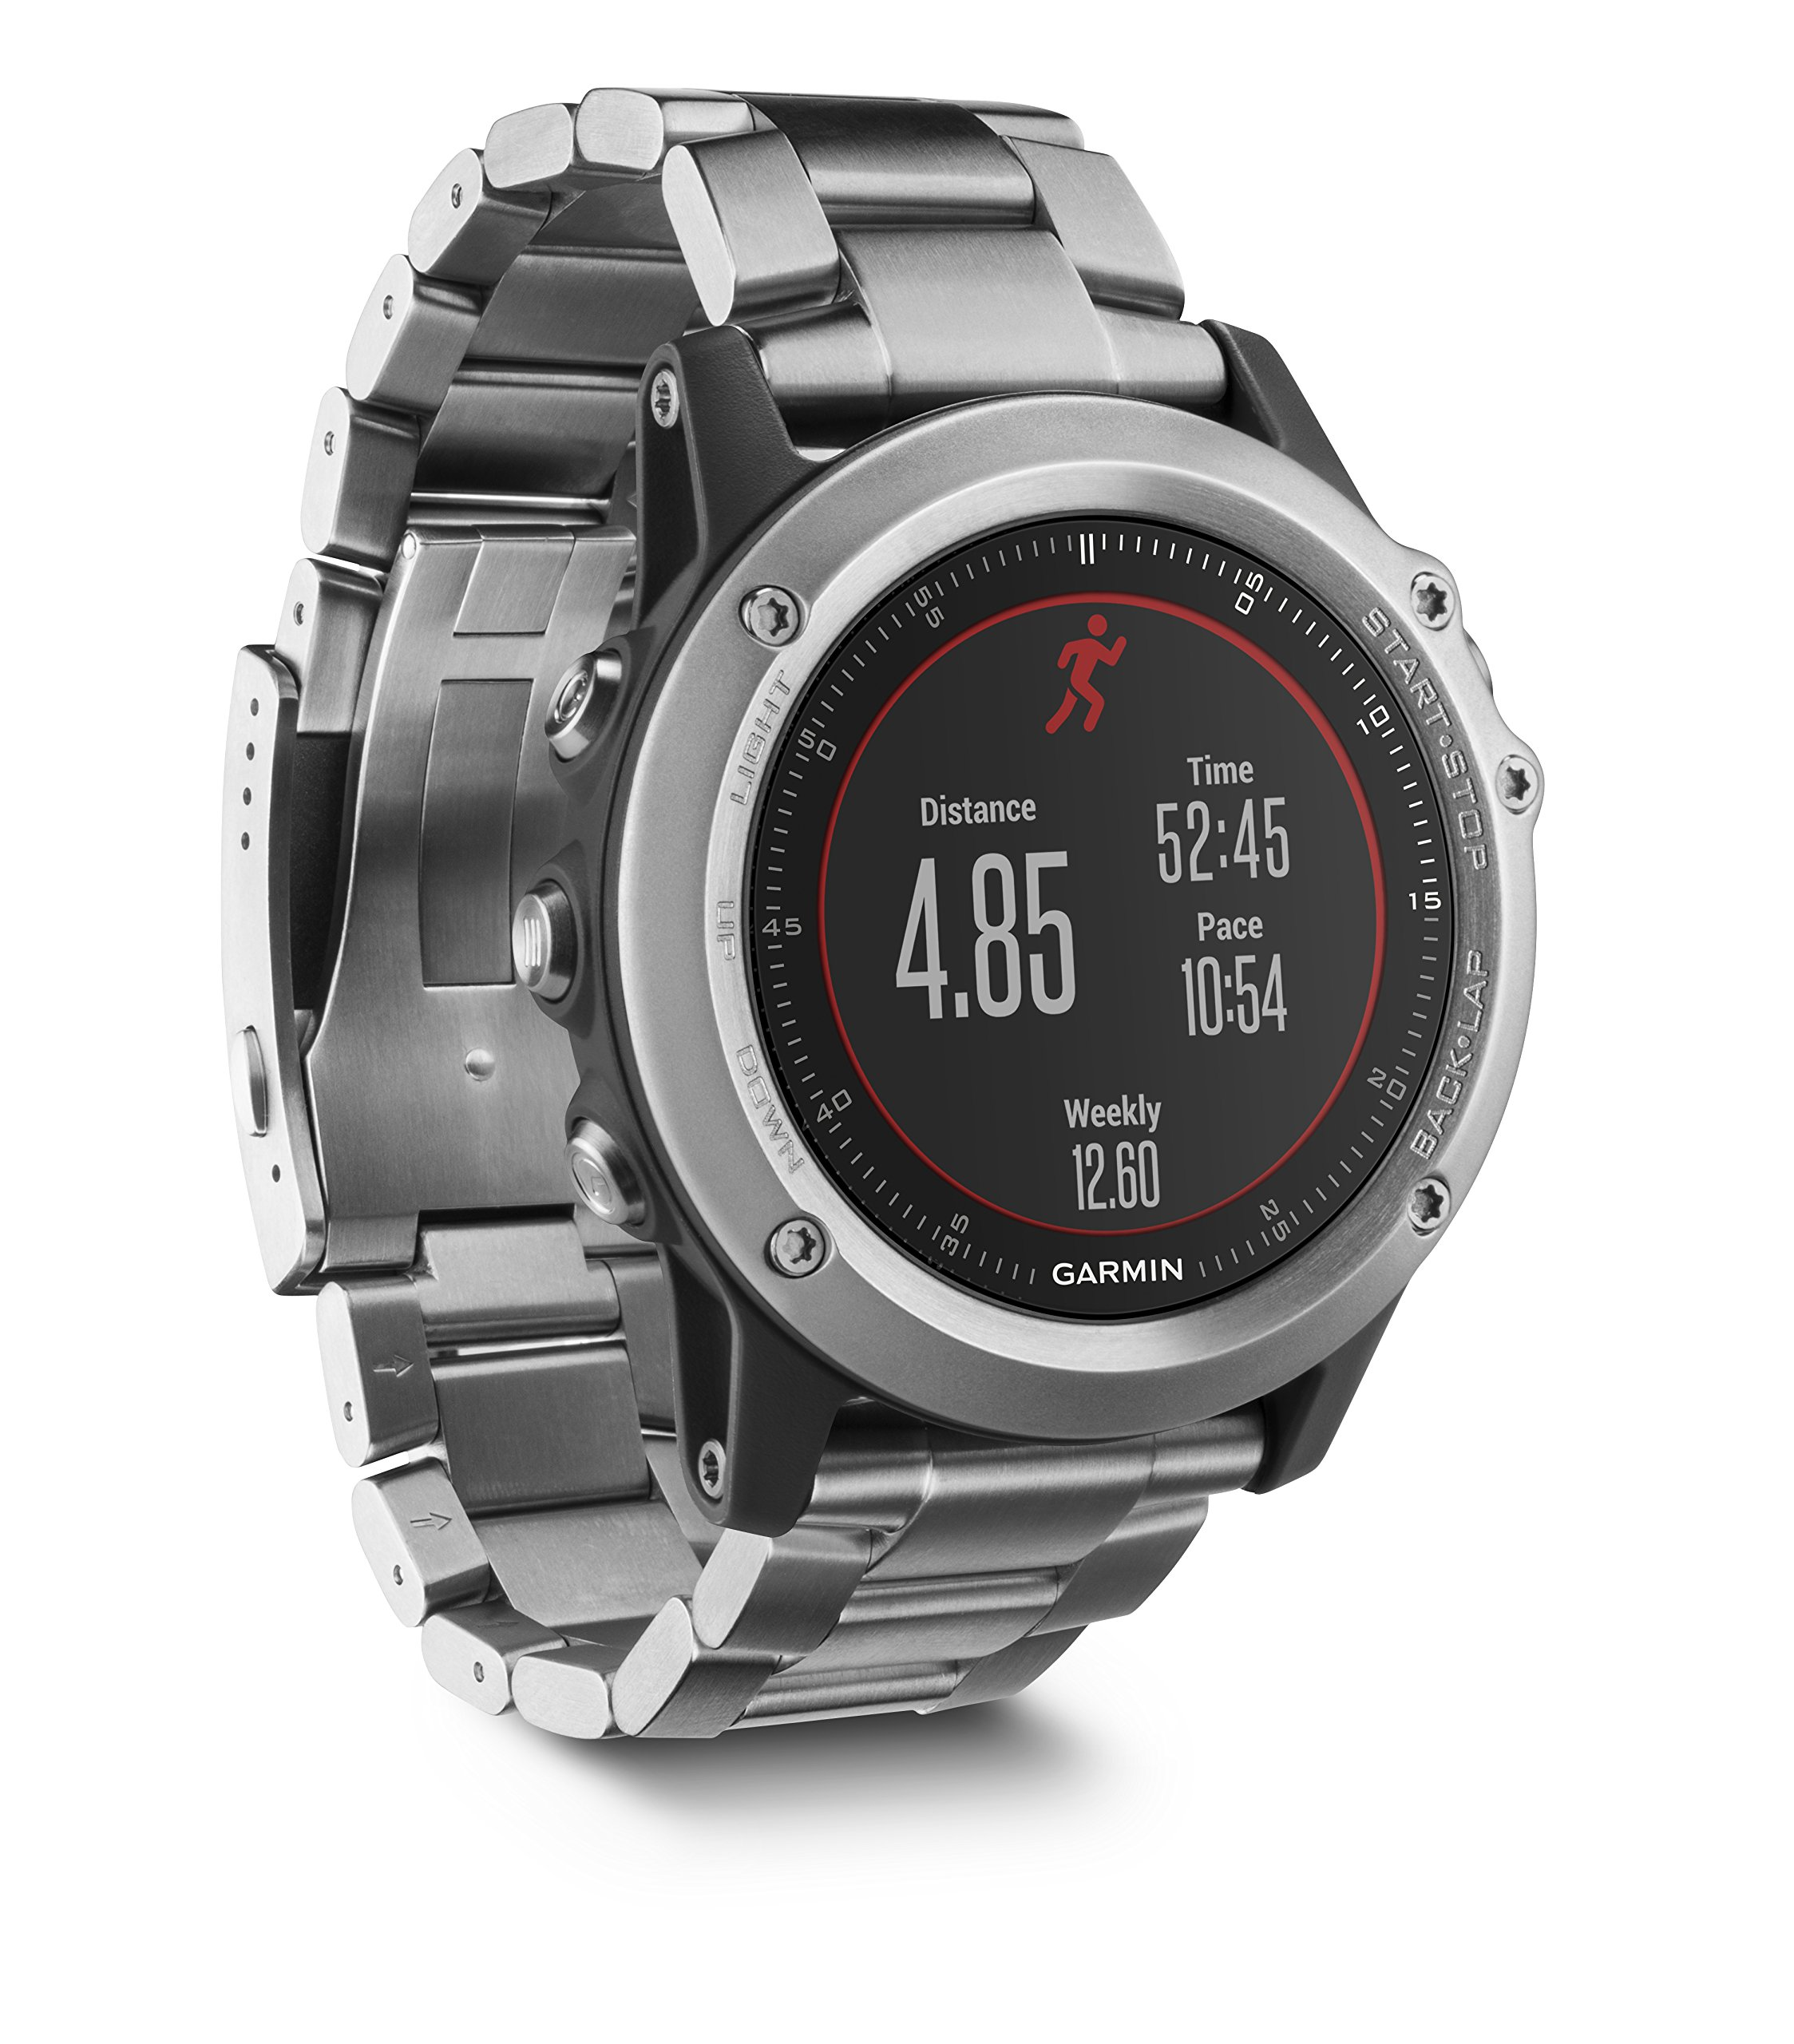 Garmin Fenix 3 HR Smartwatch GPS Multisport, Sensore Cardio al Polso, Display a Colori, Altimetro e Bussola, Nero/Grigio 1 spesavip